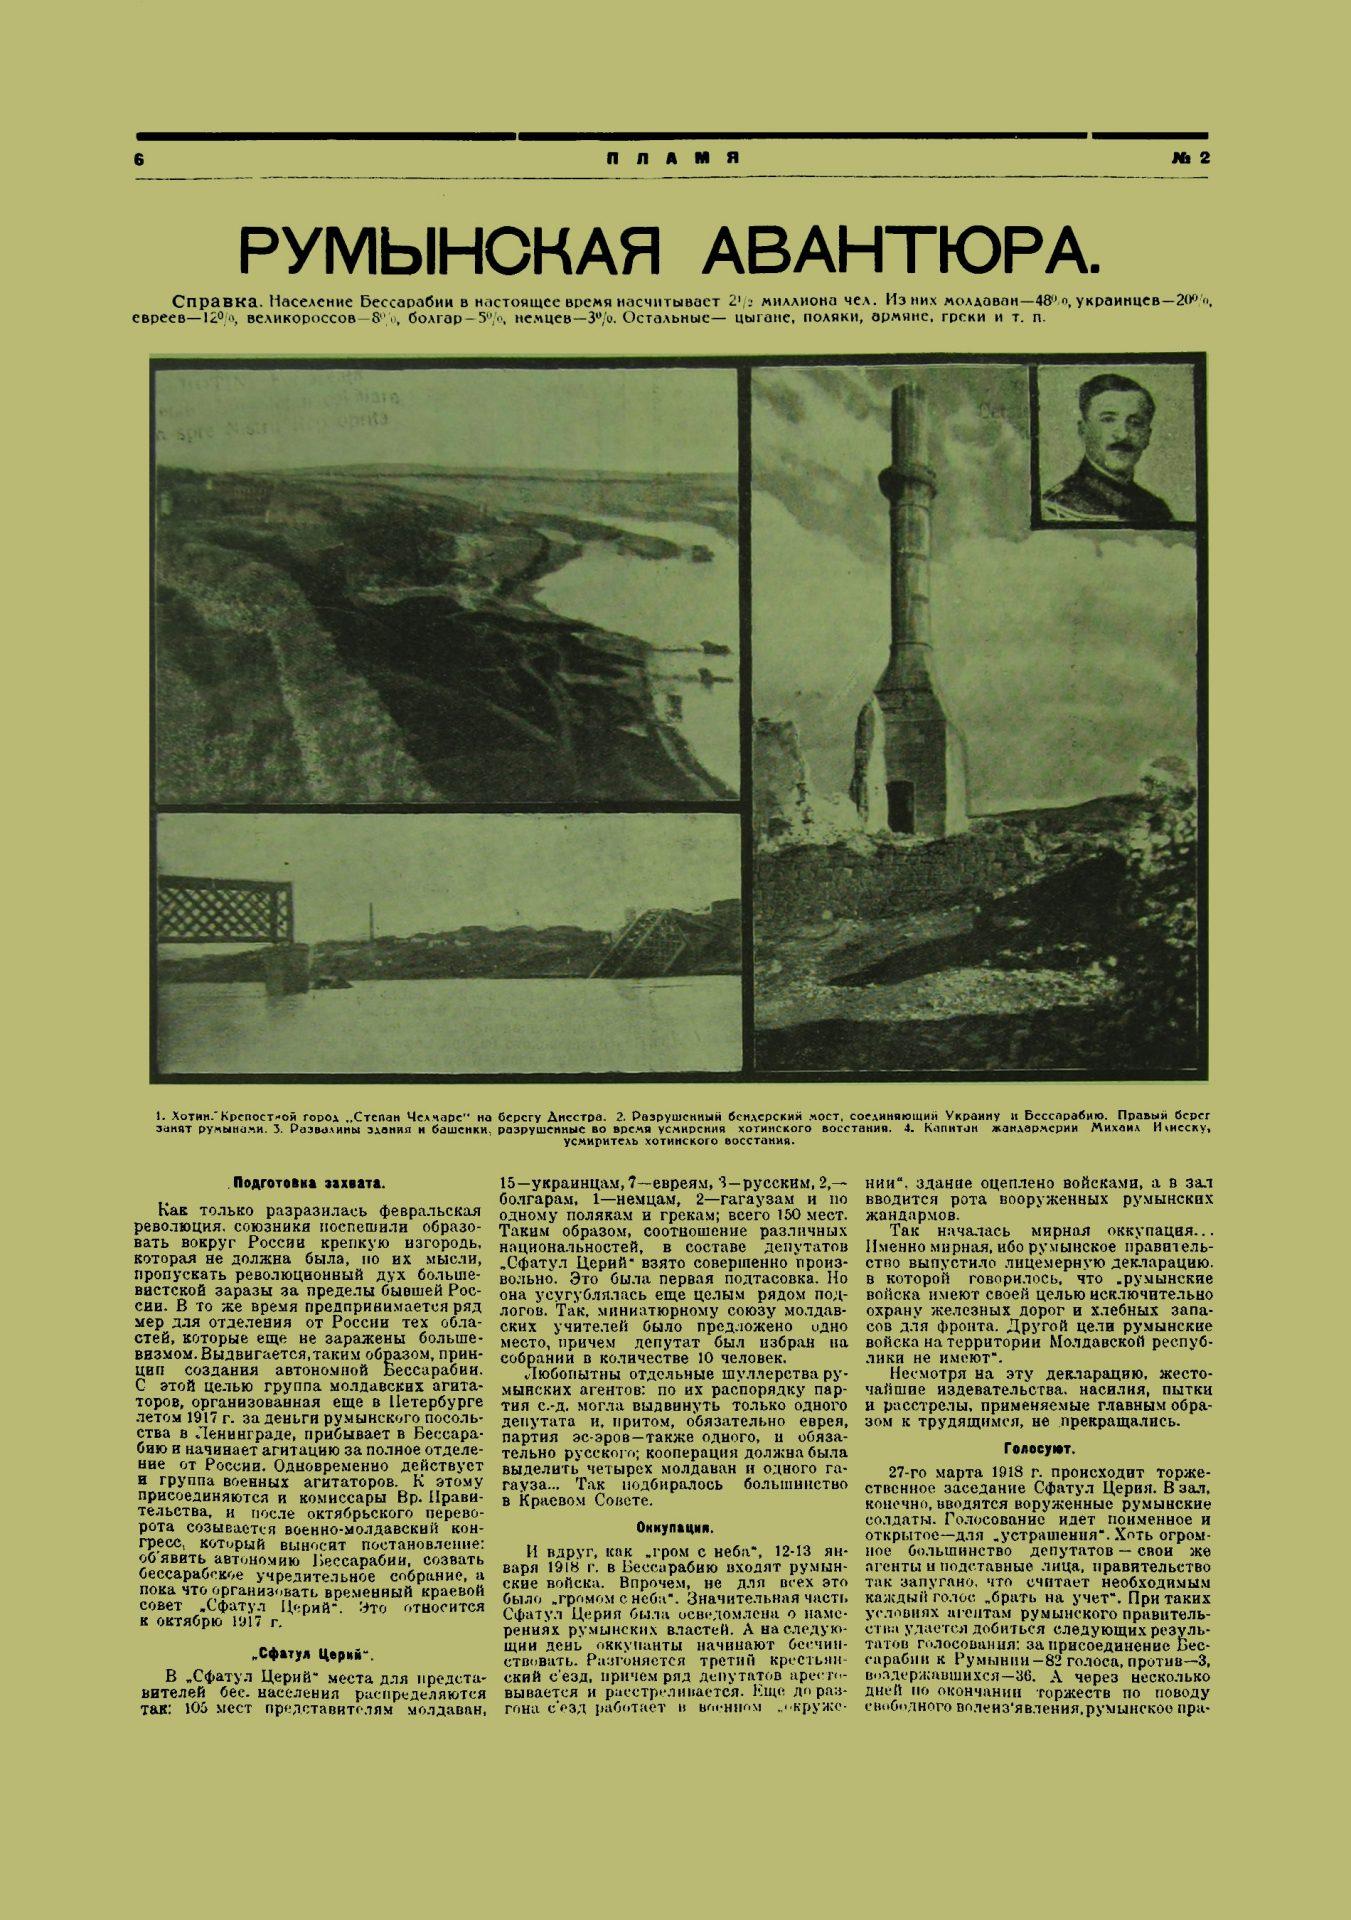 Пламя_1924_№2